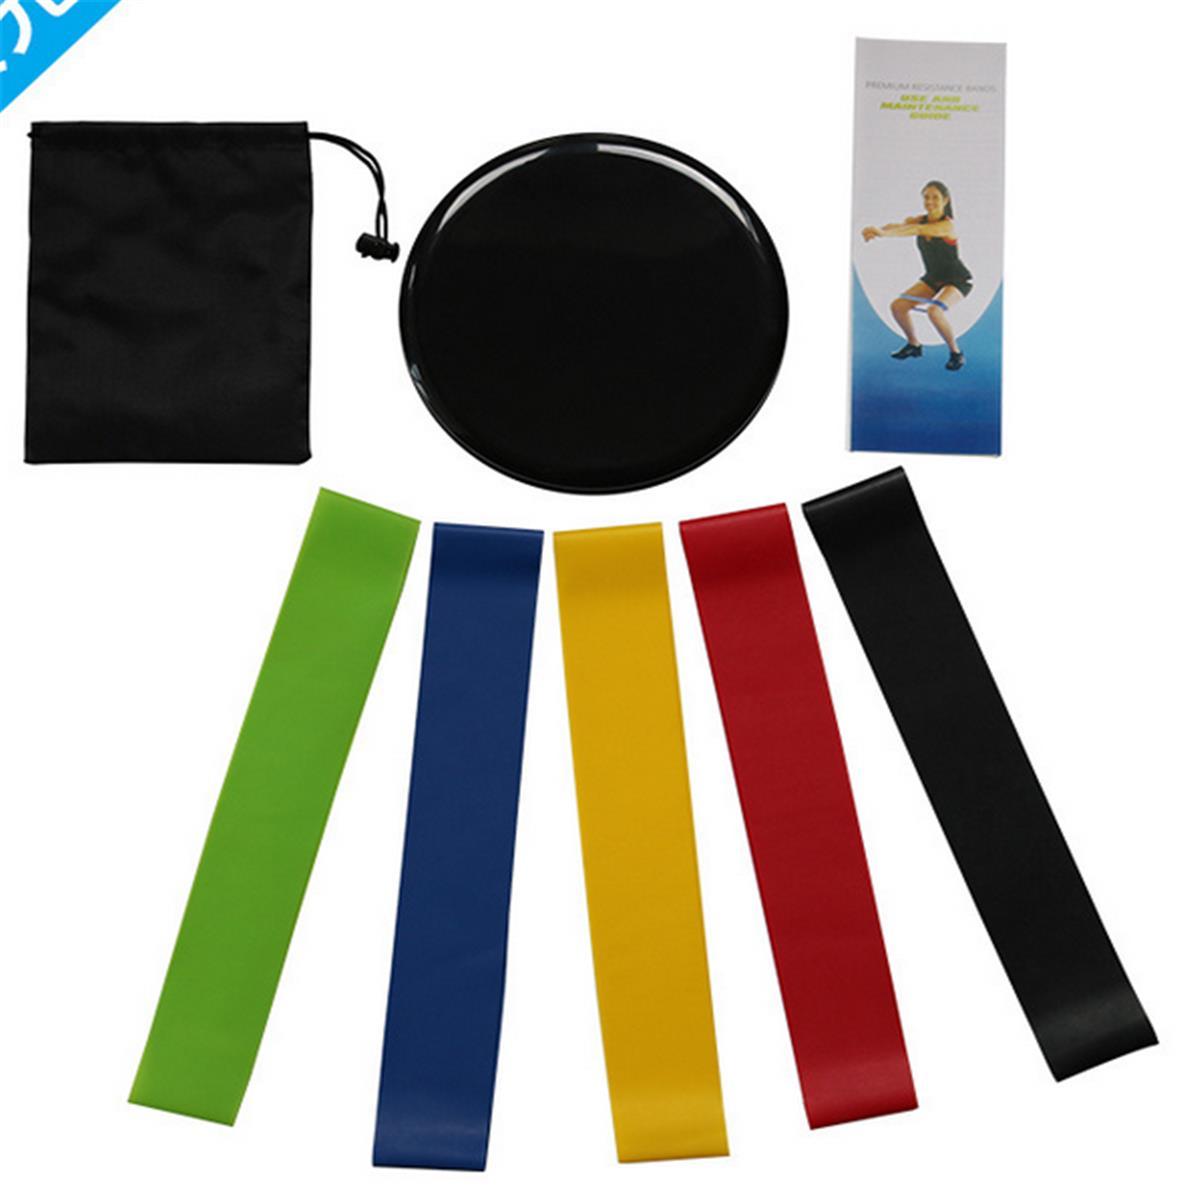 7 Pcs/ Set Fitness Equipment 2 Pcs Black Fitness Slide Plate 5 Pcs Different Strength Tension Ring